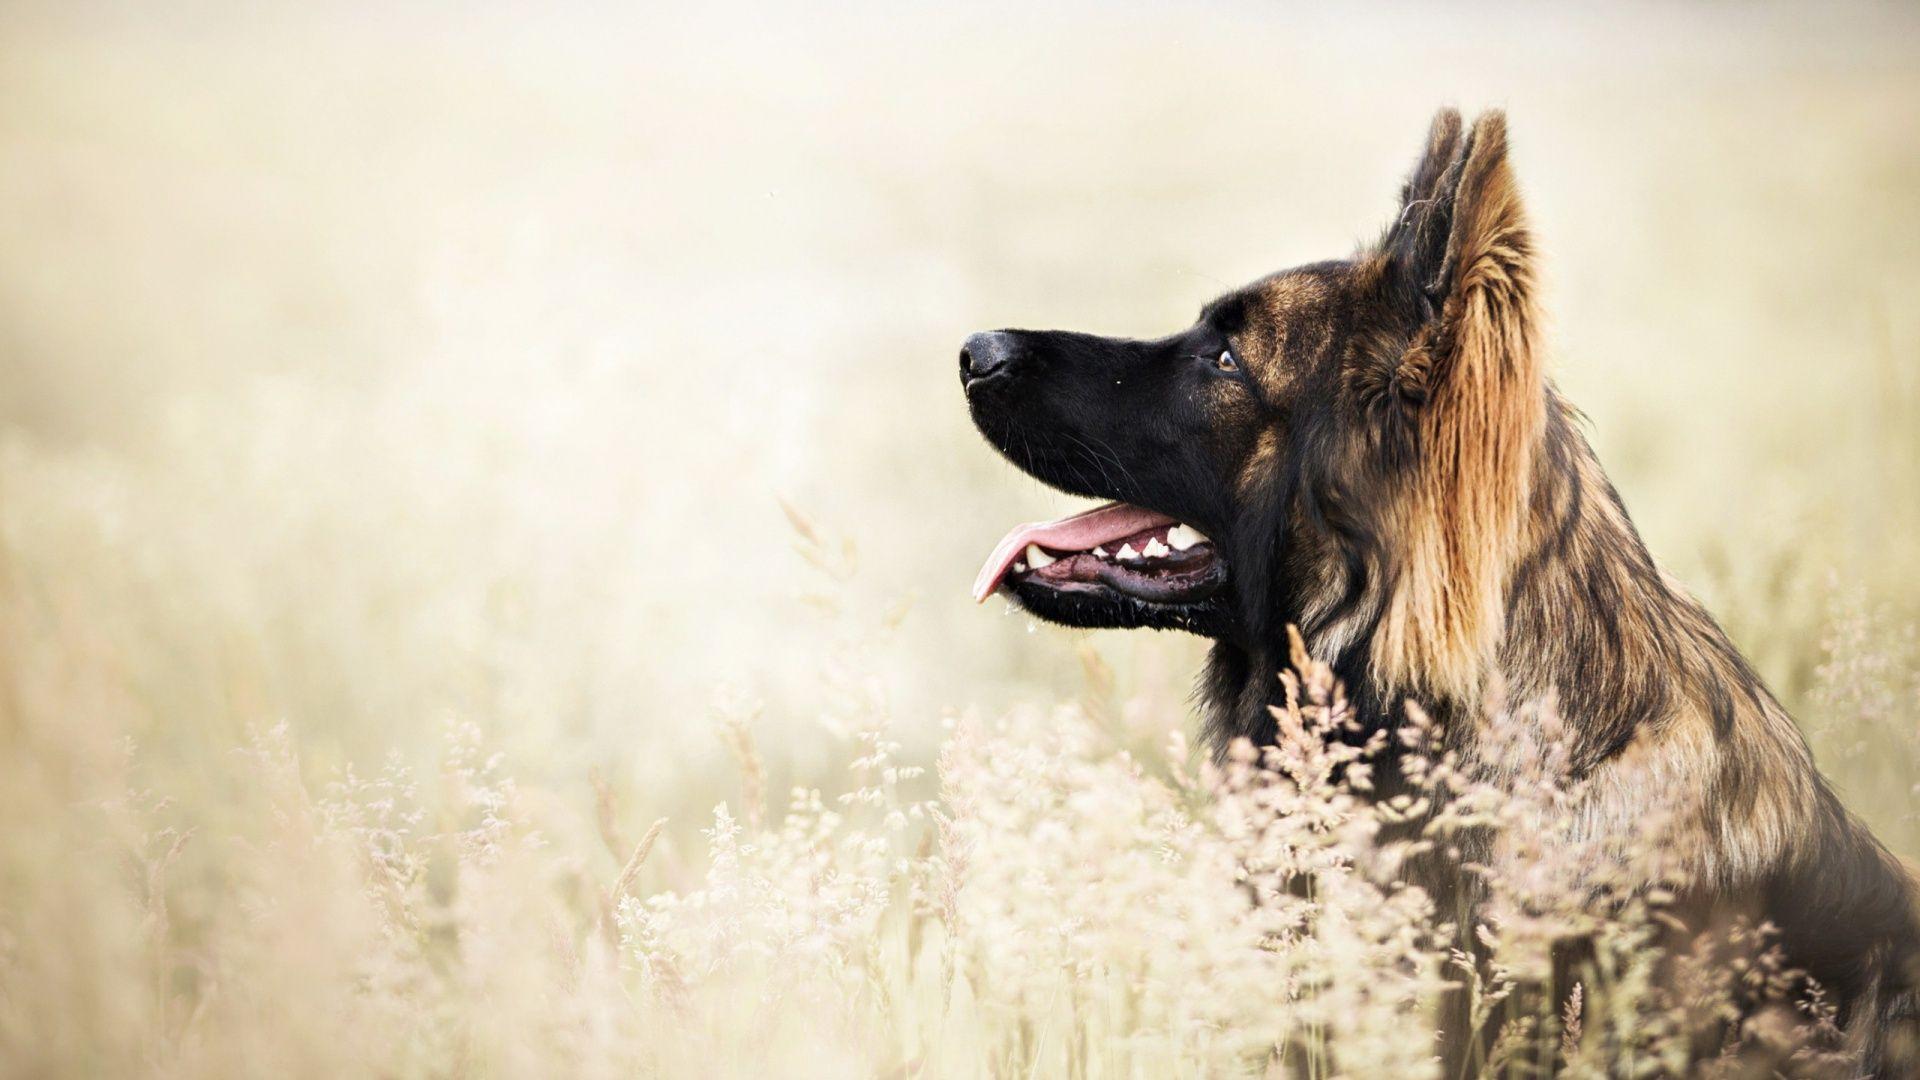 Cool Dog Desktop Wallpapers Top Free Cool Dog Desktop Backgrounds Wallpaperaccess